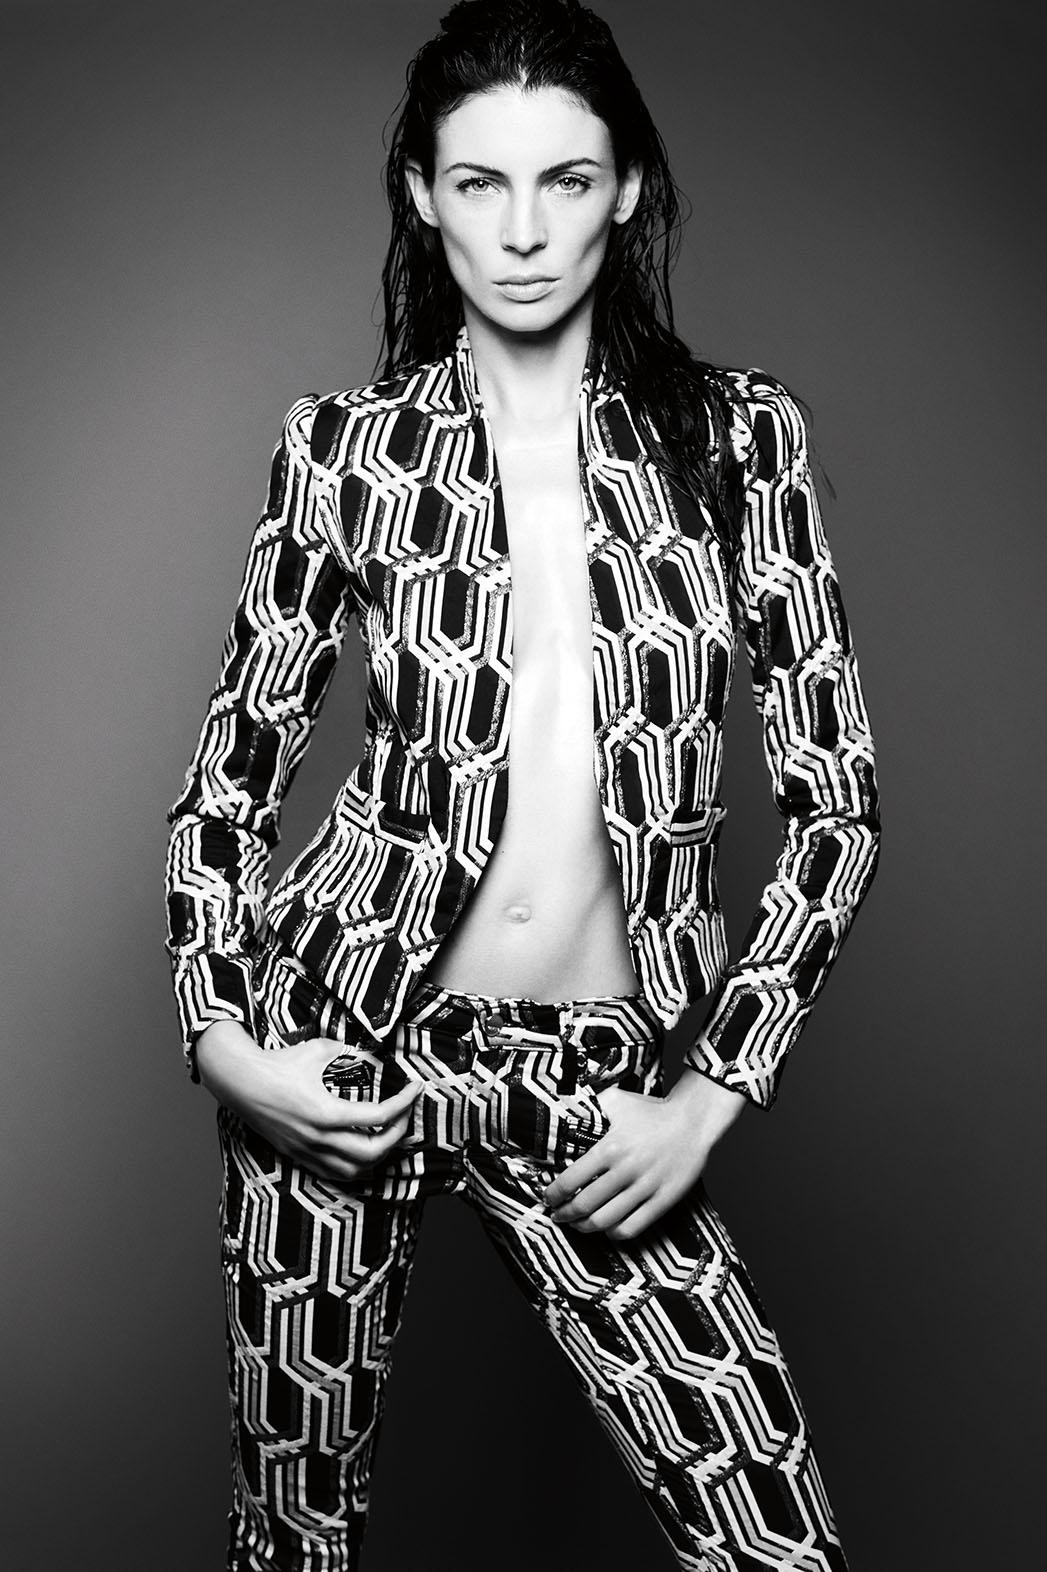 GENETIC x Liberty Ross Jacquard suit - P 2014